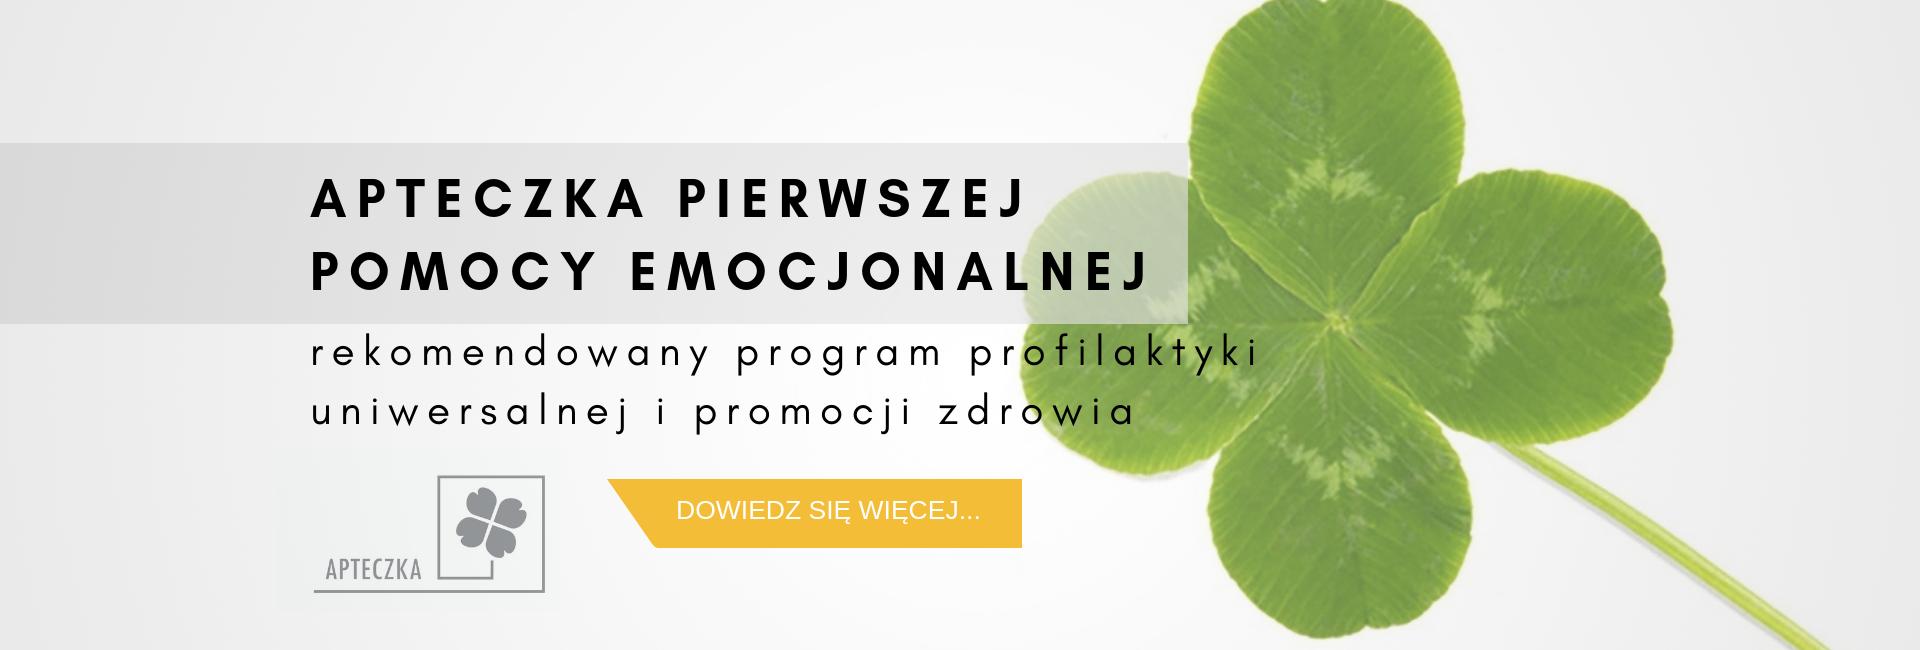 baner_apteczka